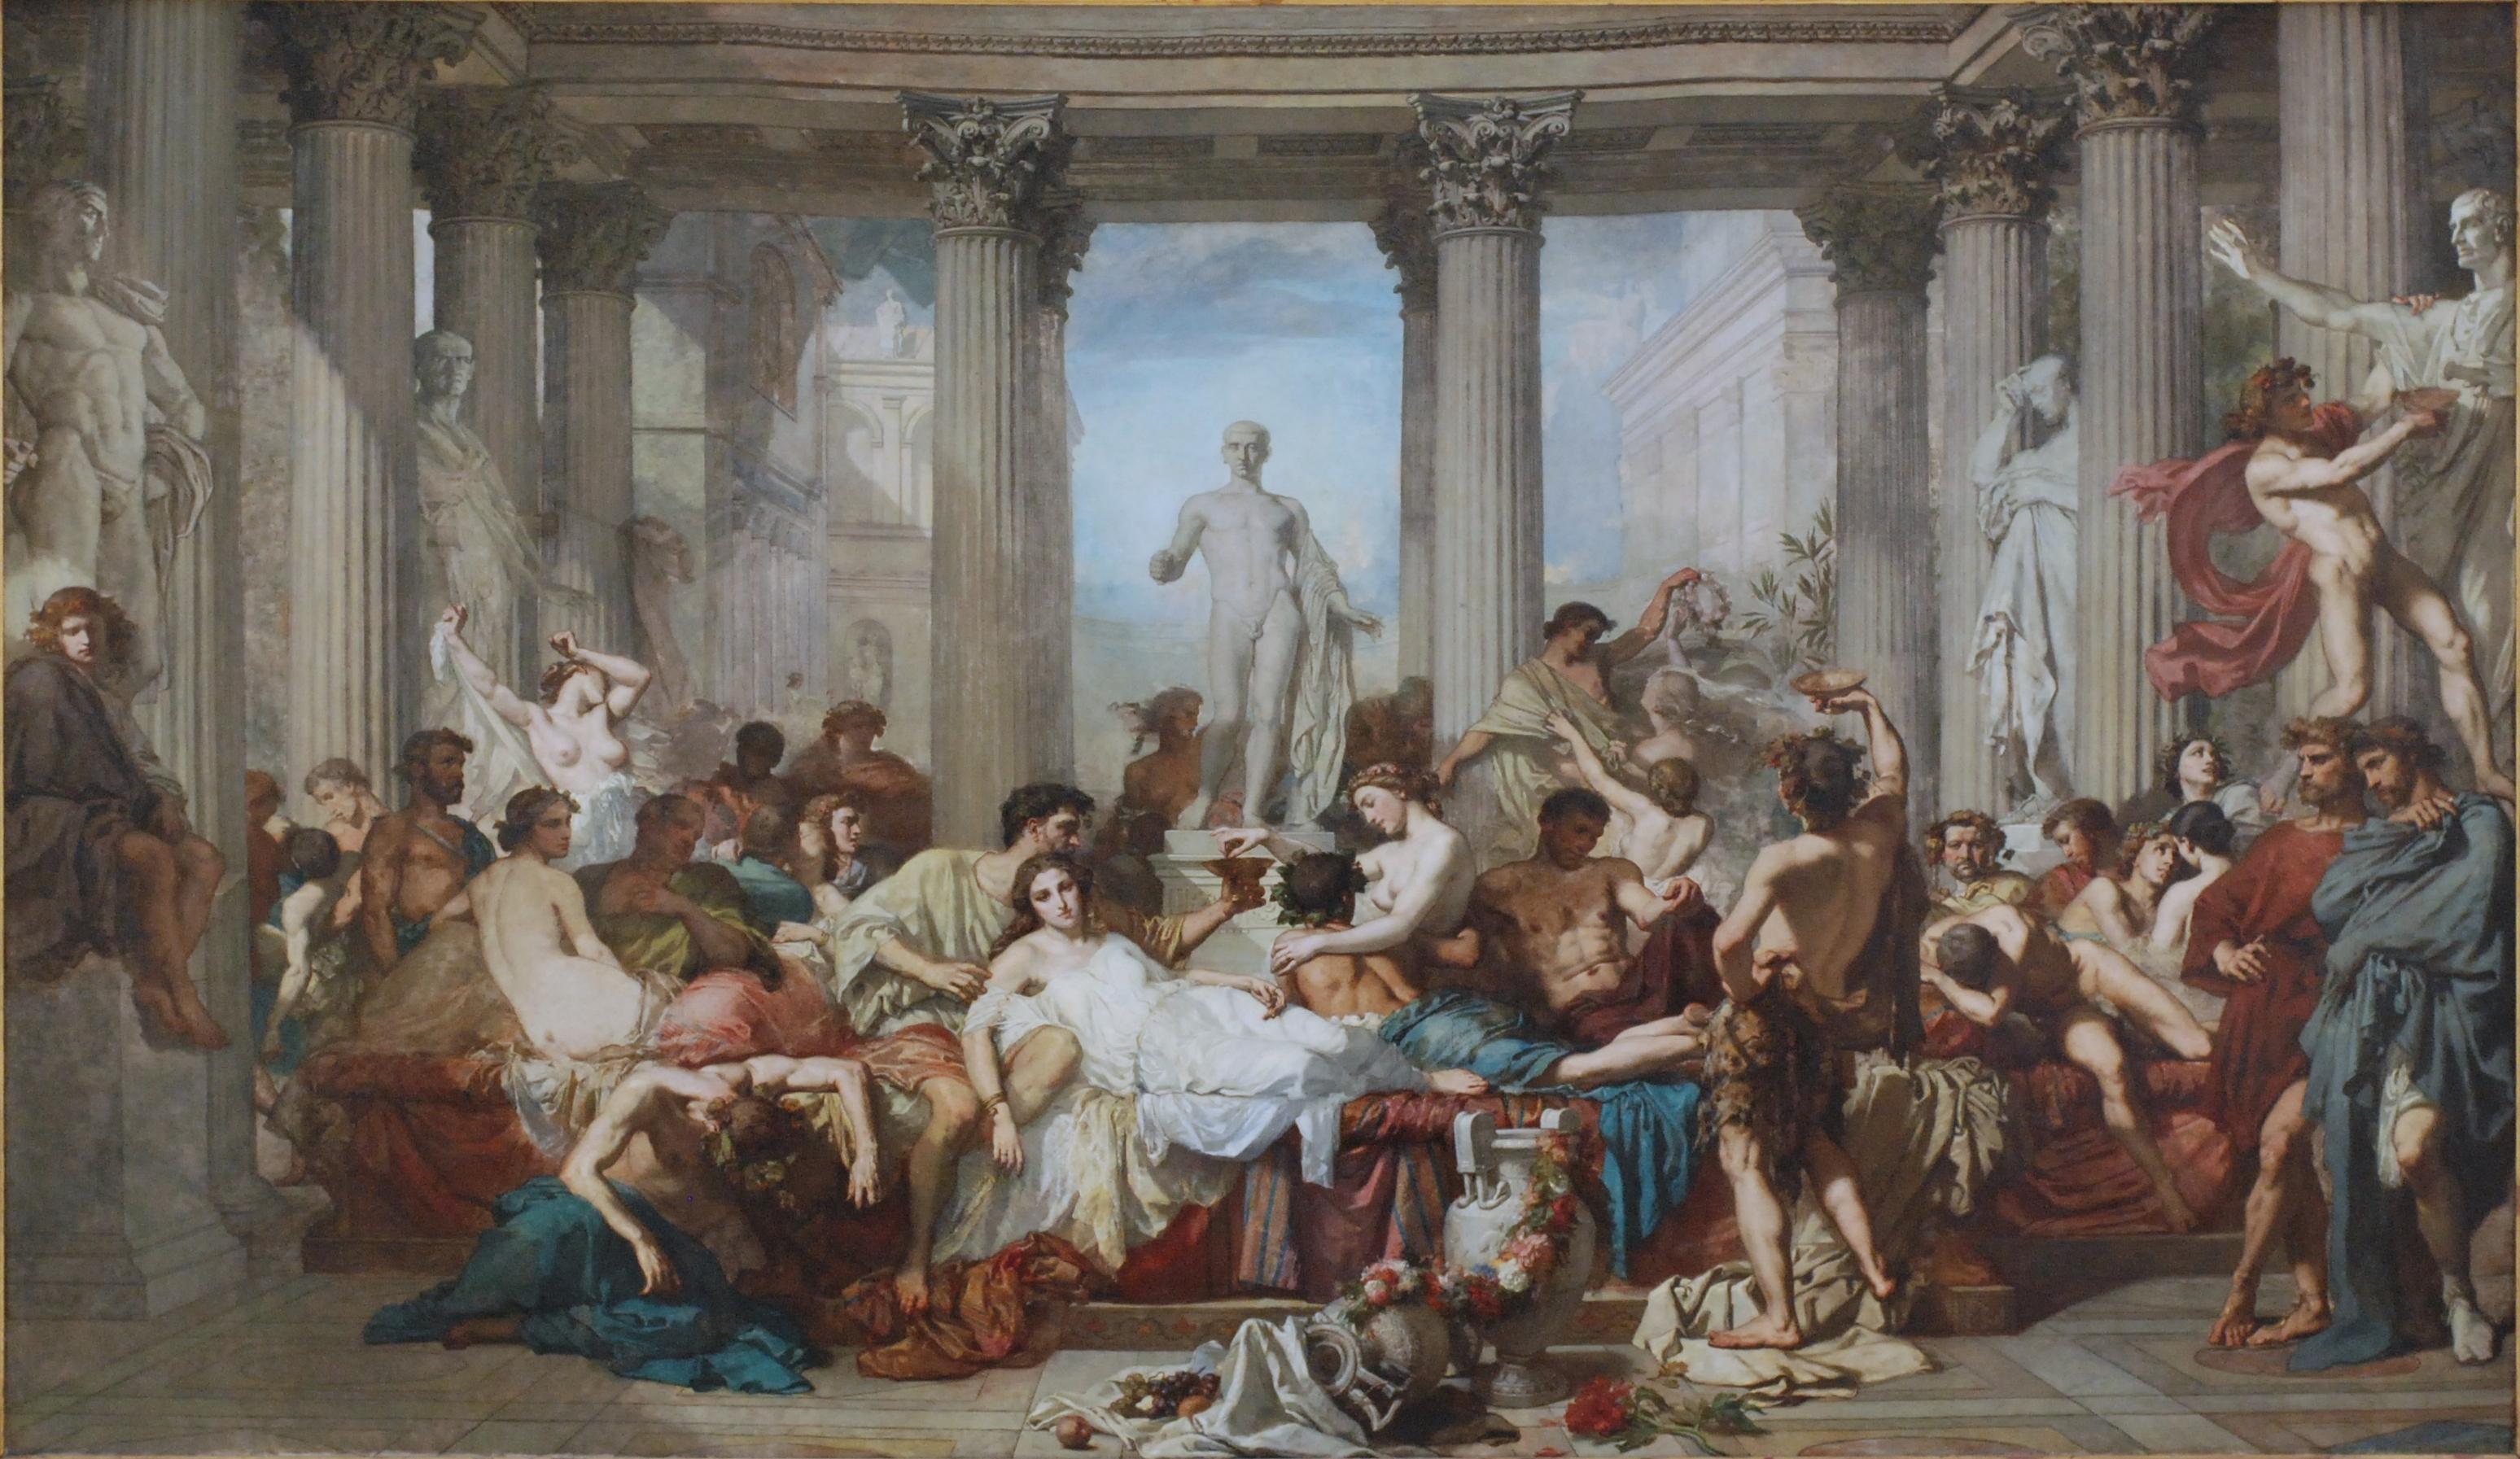 musee-dorsay-couture-les-romains-de-la-decadence